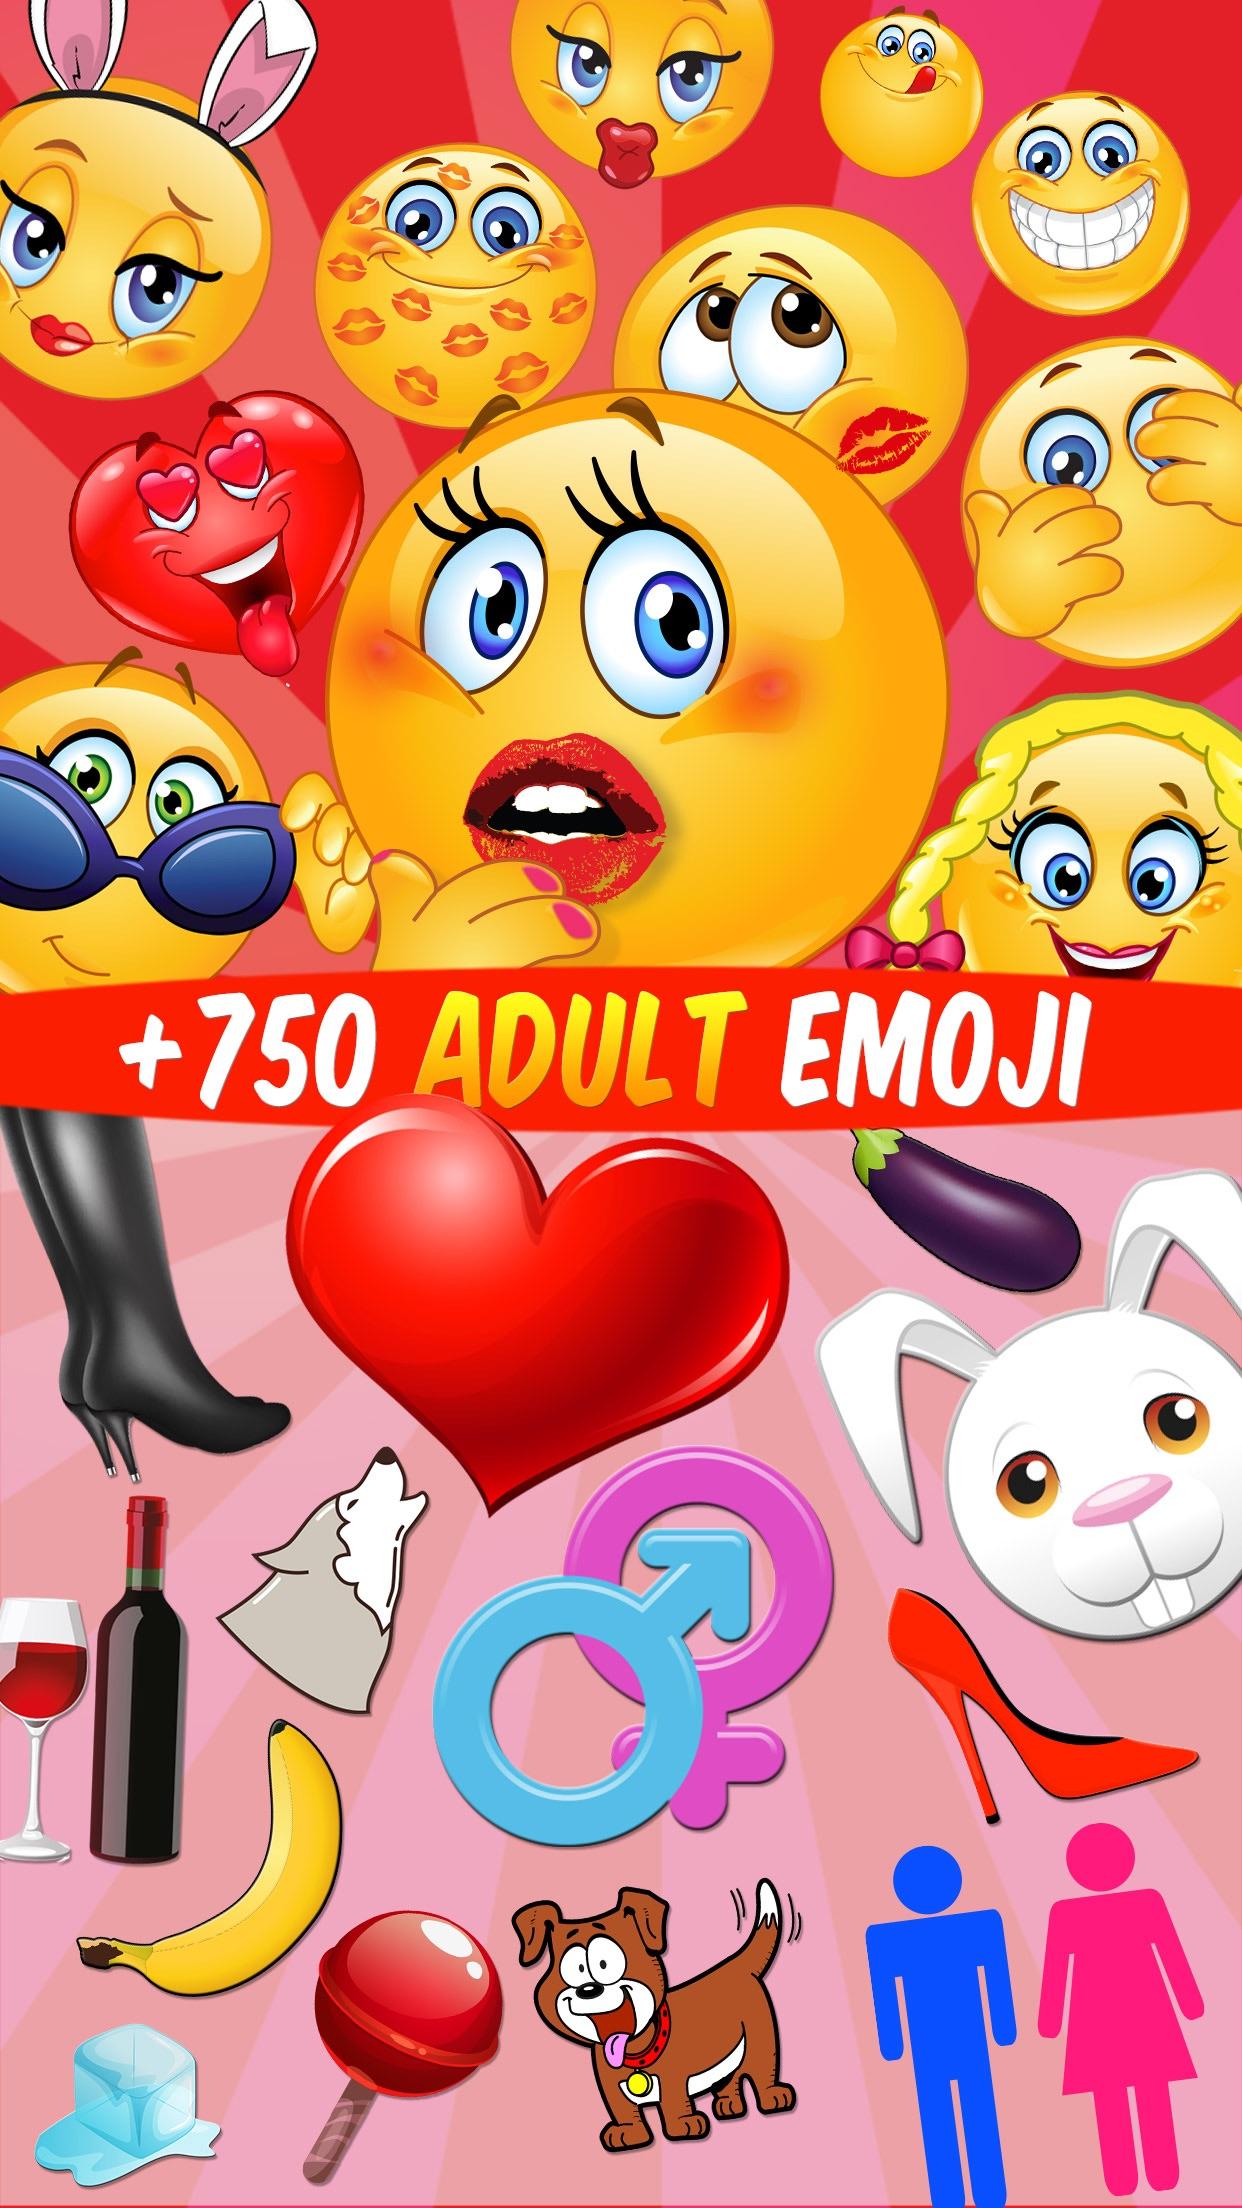 Adult Emoji, Flirty Icons and Sexy Text Screenshot